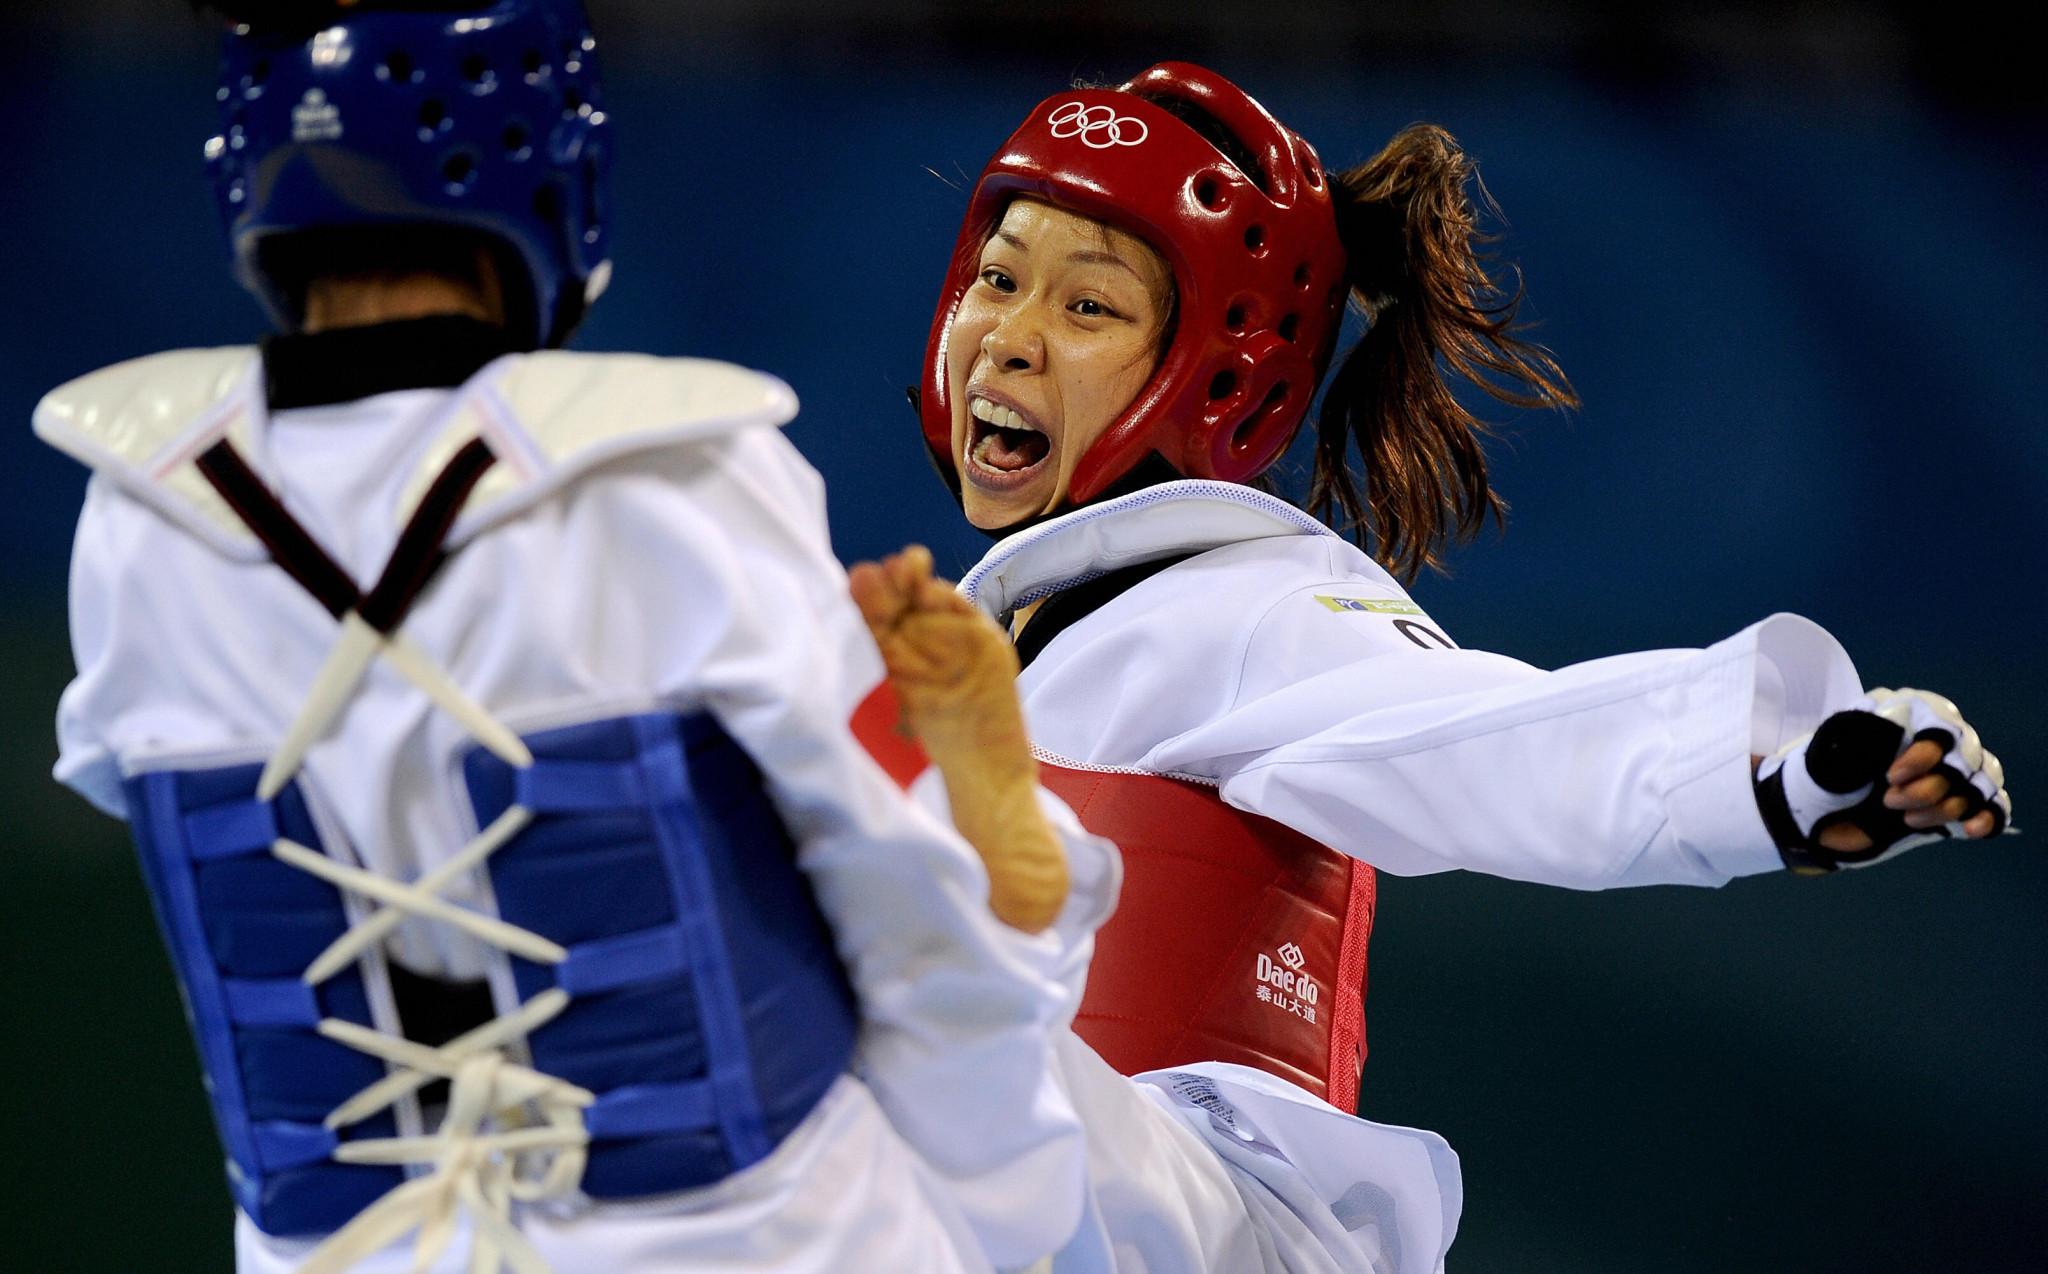 Shoko Ota switched to taekwondo from skiing after meeting Olympic bronze medallist Yoriko Okamoto ©Getty Images